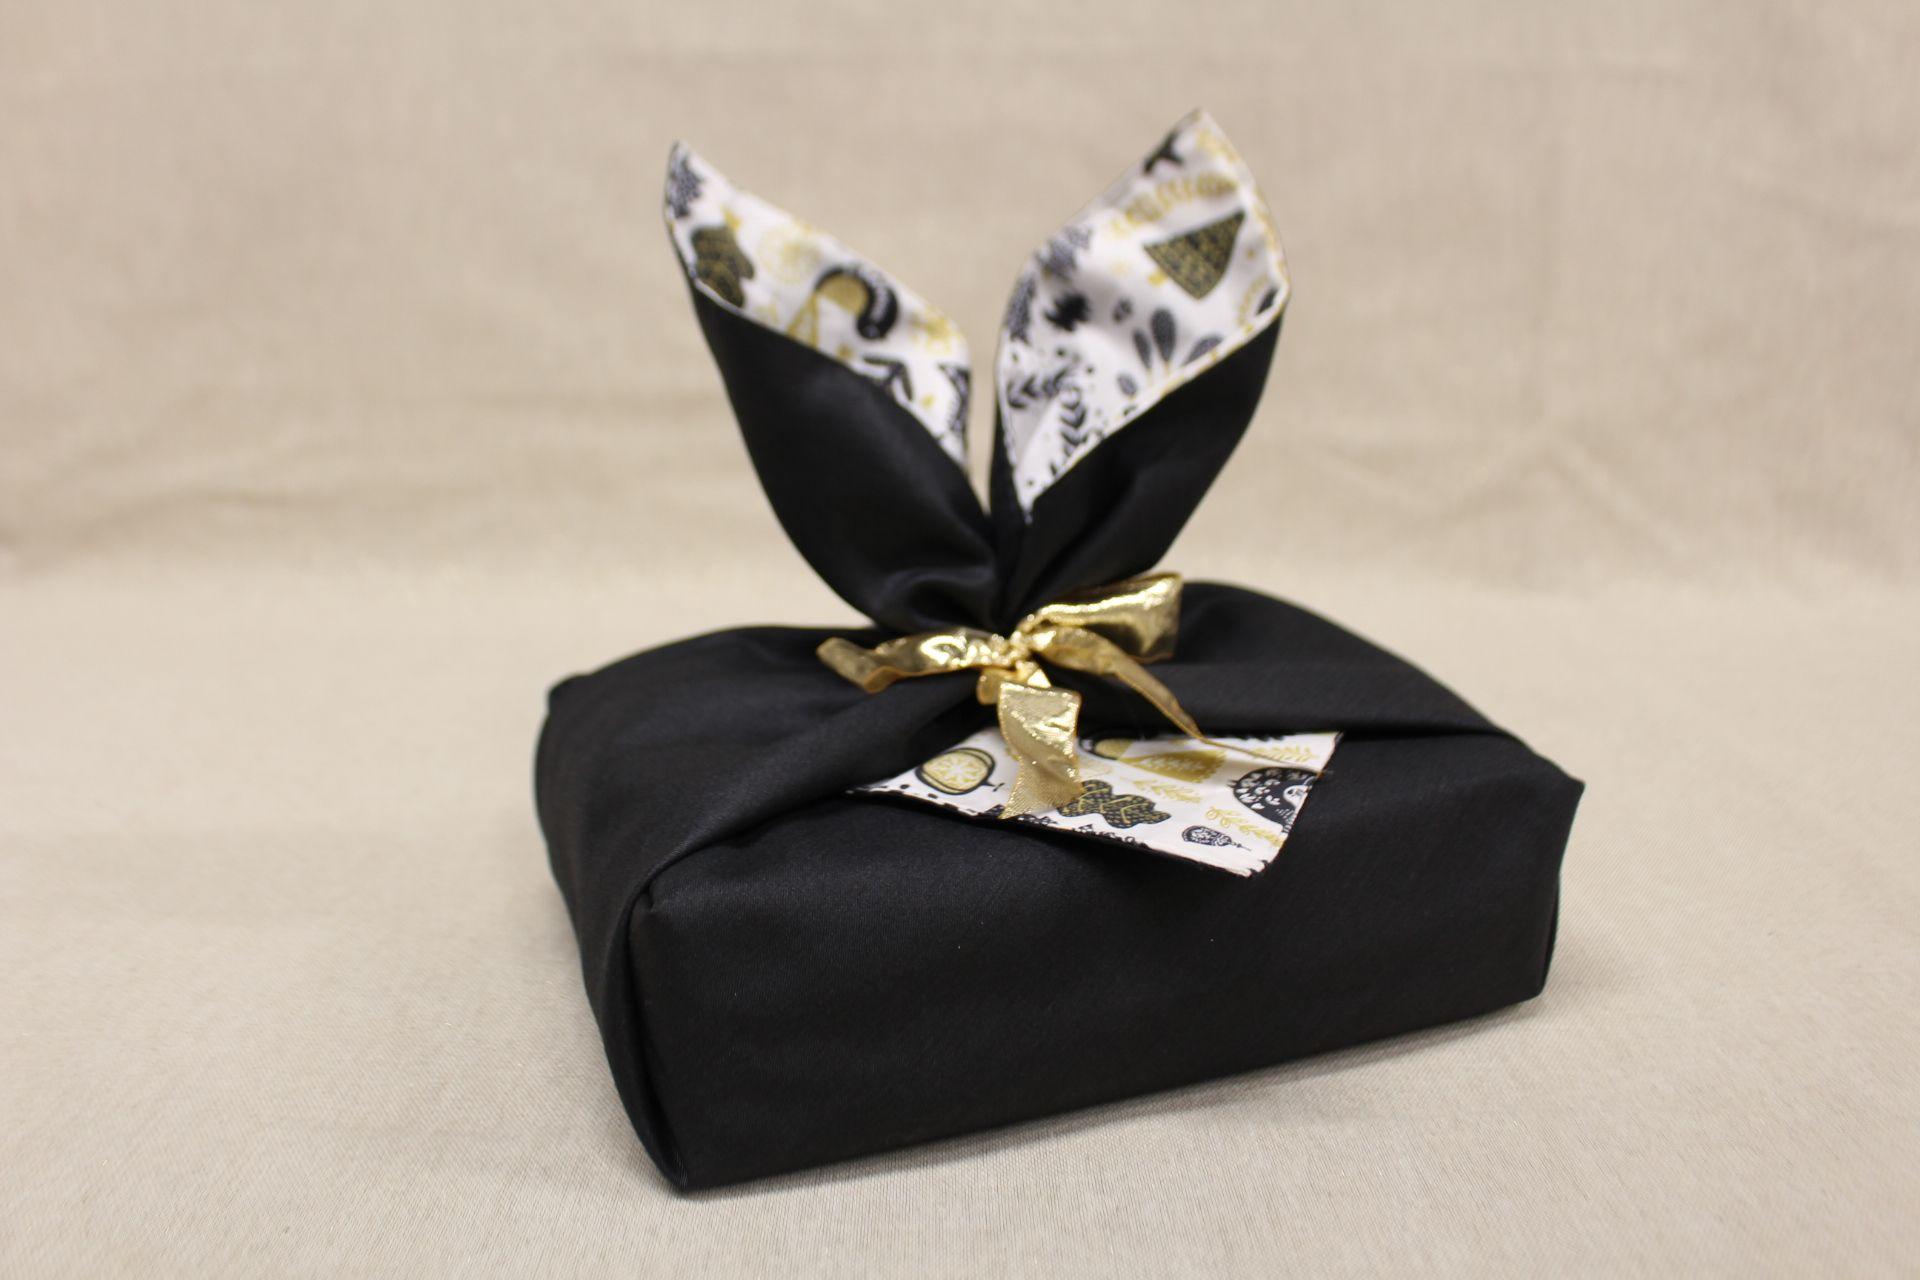 Mon emballage cadeau en tissu : le tuto Furoshiki (nouvelle version)